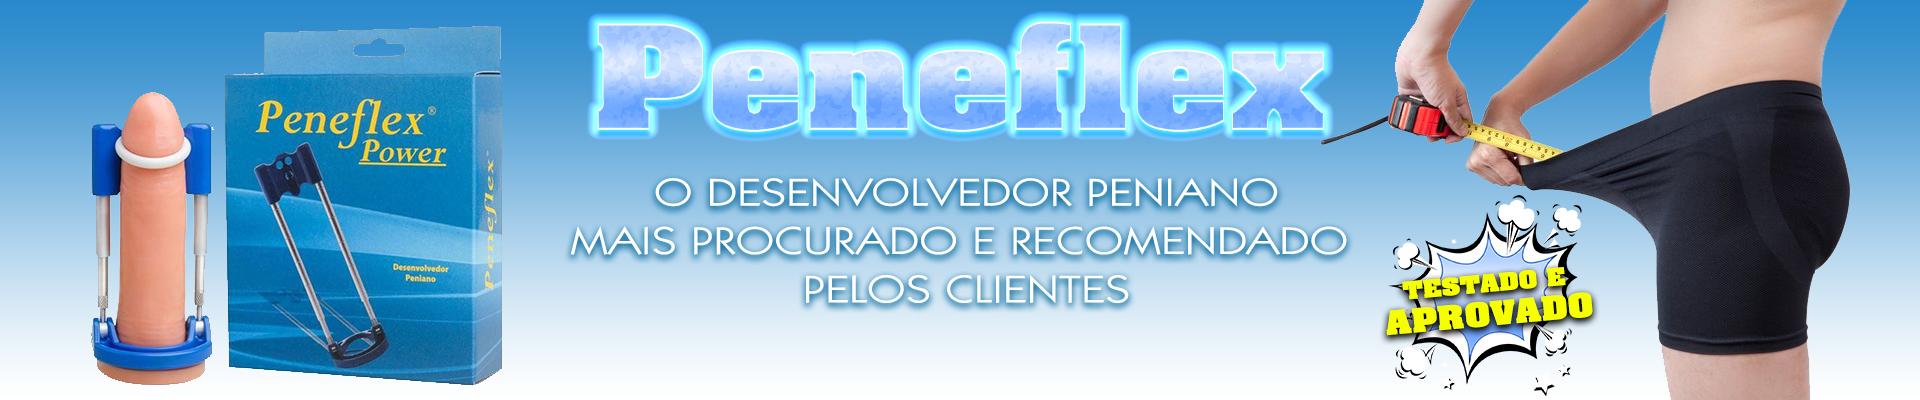 peneflex